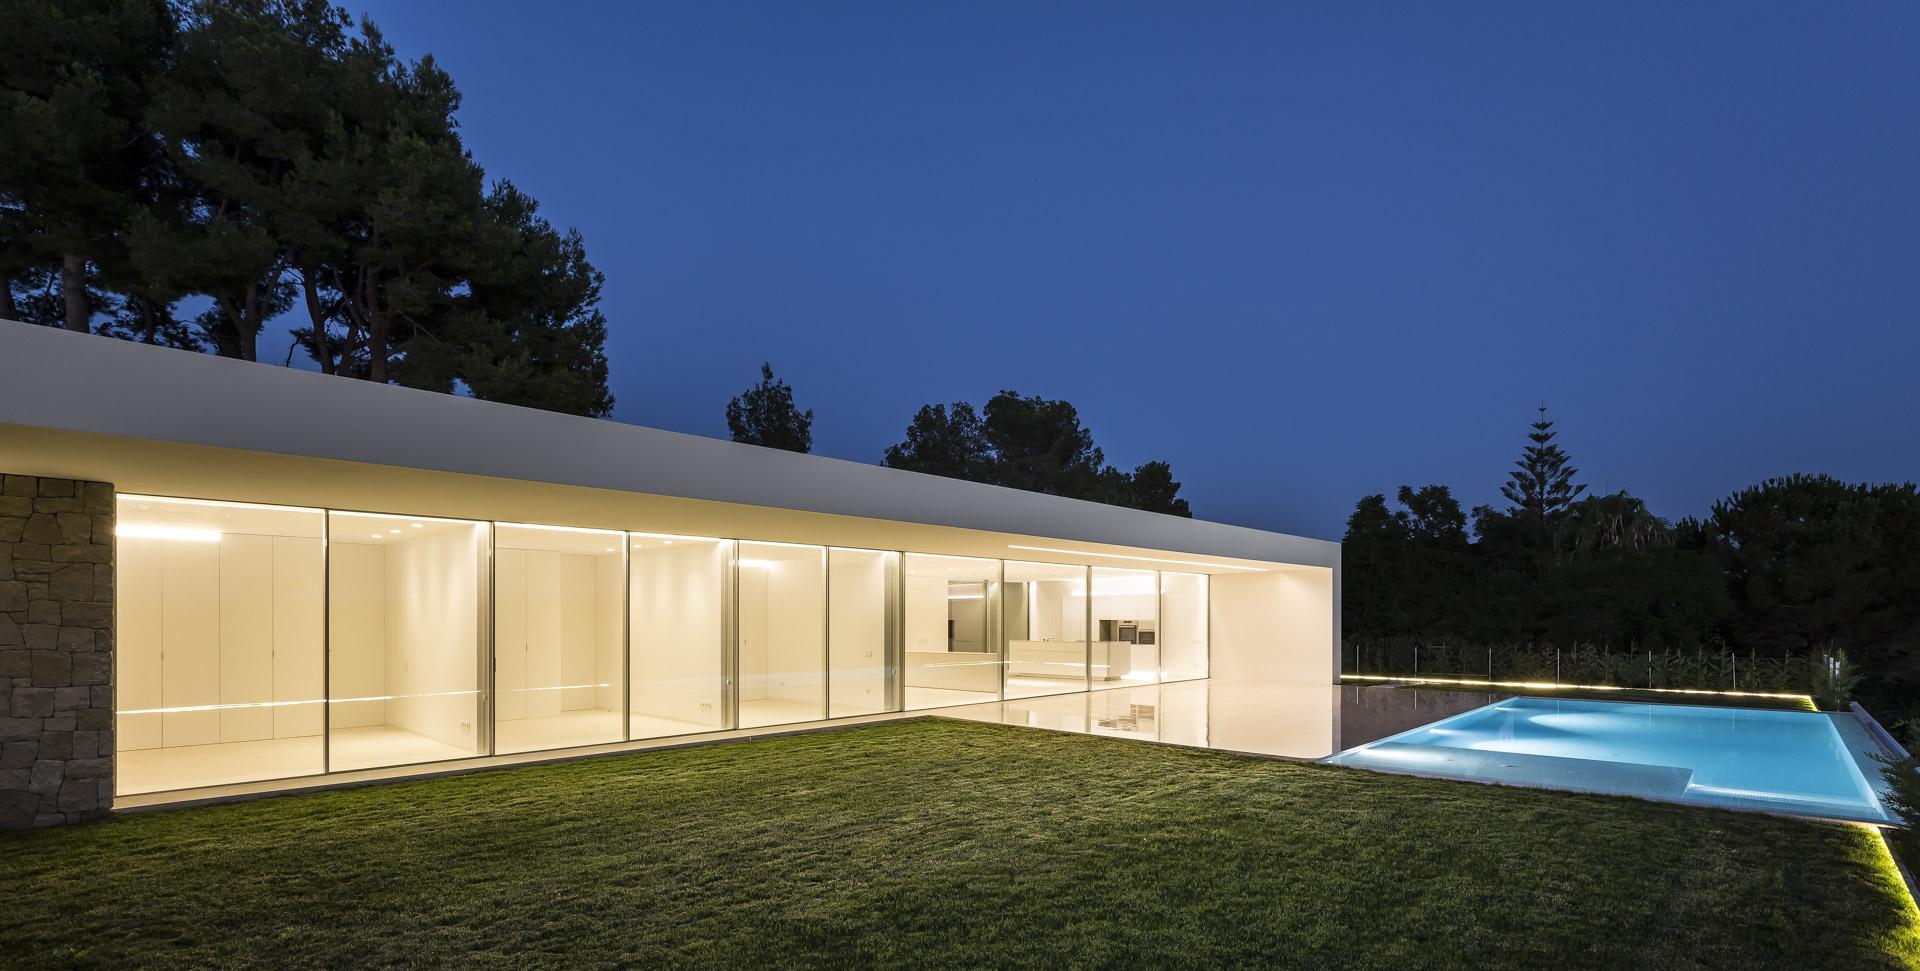 fotografia-arquitectura-valencia-german-cabo-gallardo-llopis-villamarchante-vivienda-61